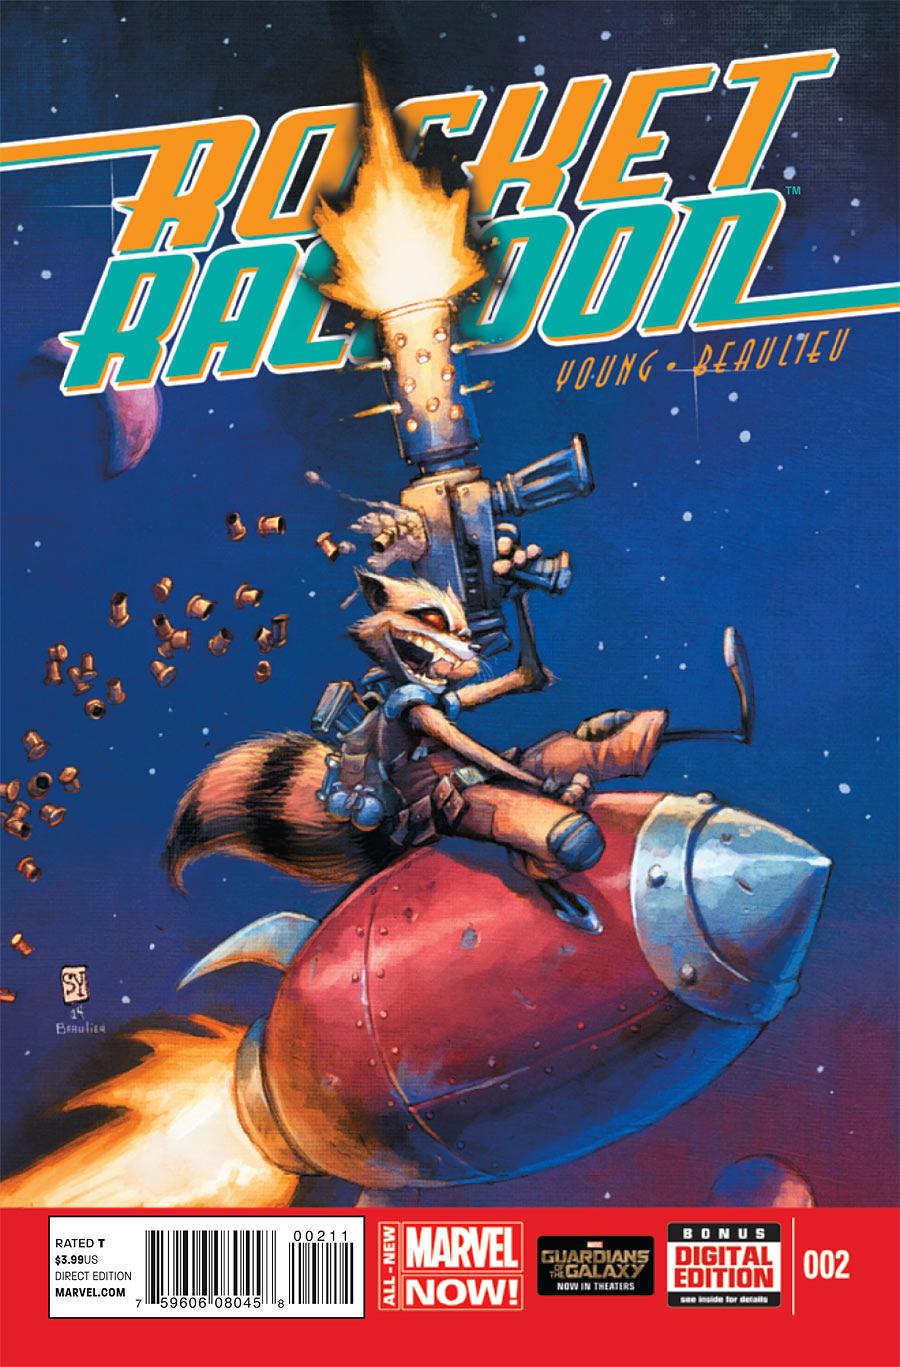 http://ifanboy.com/wp-content/uploads/2014/08/Rocket-Raccoon_2.jpg